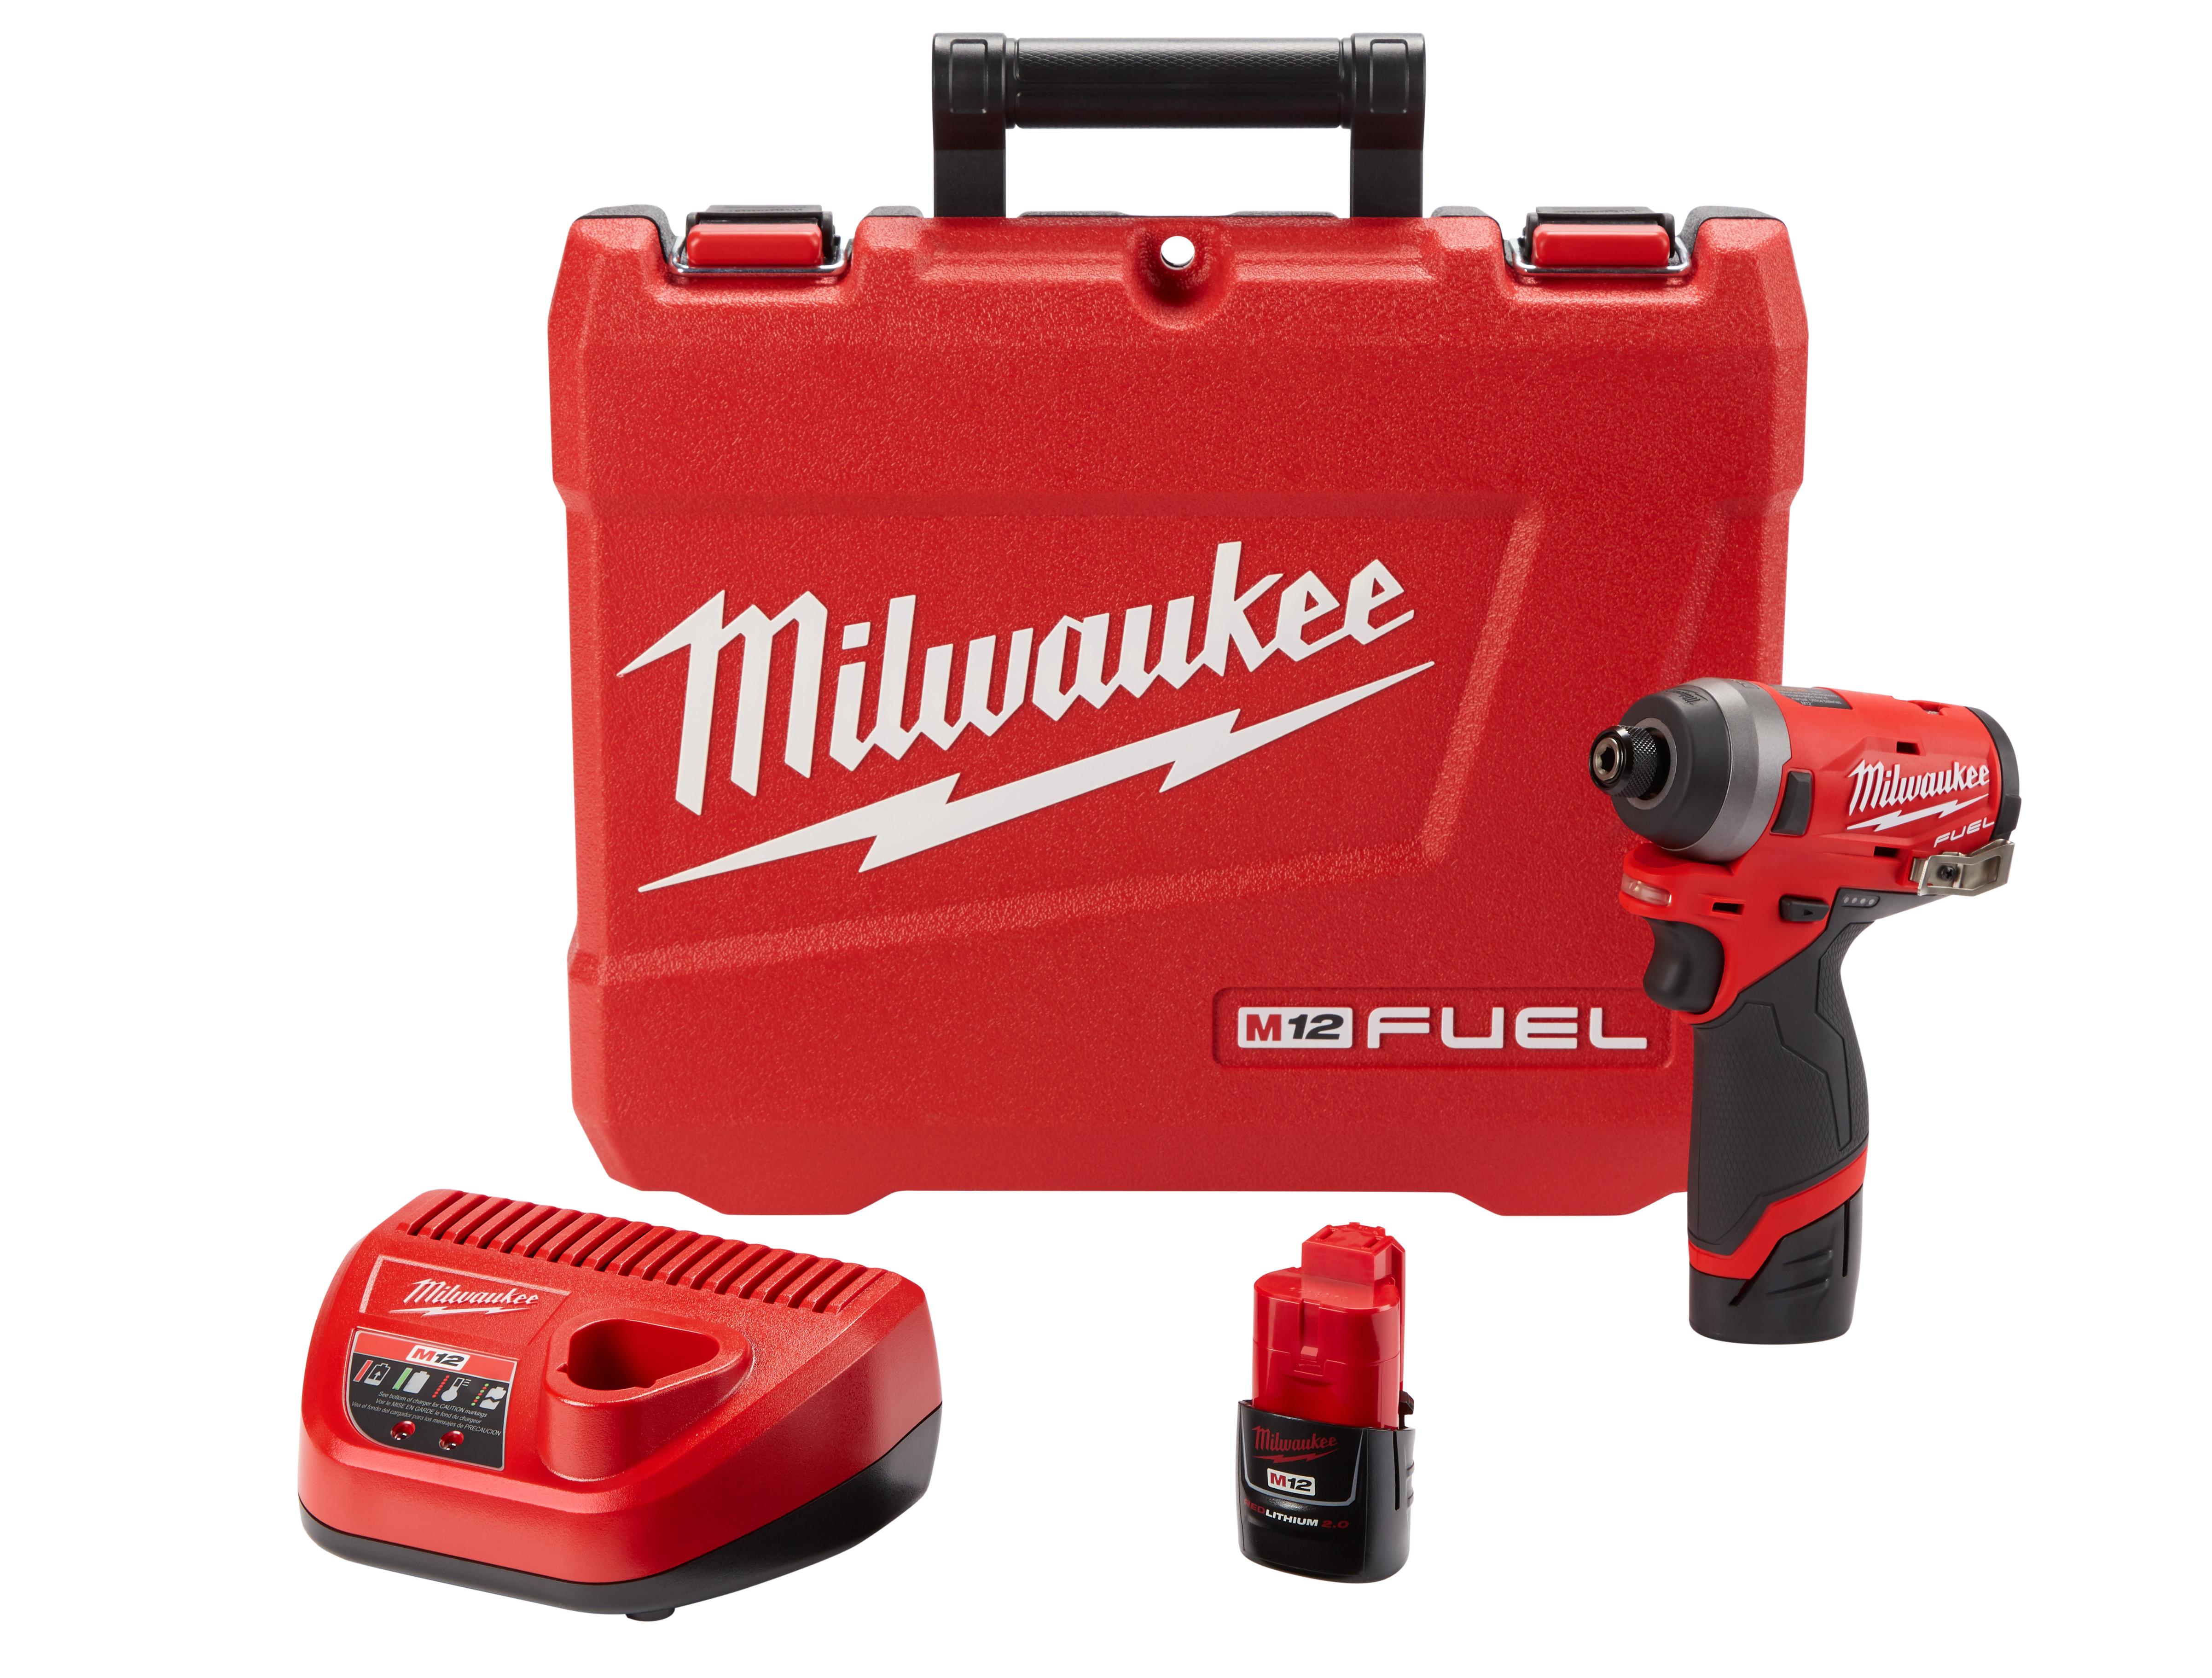 2553-22 MILWAUKE HEX MPCT DRIVER KIT